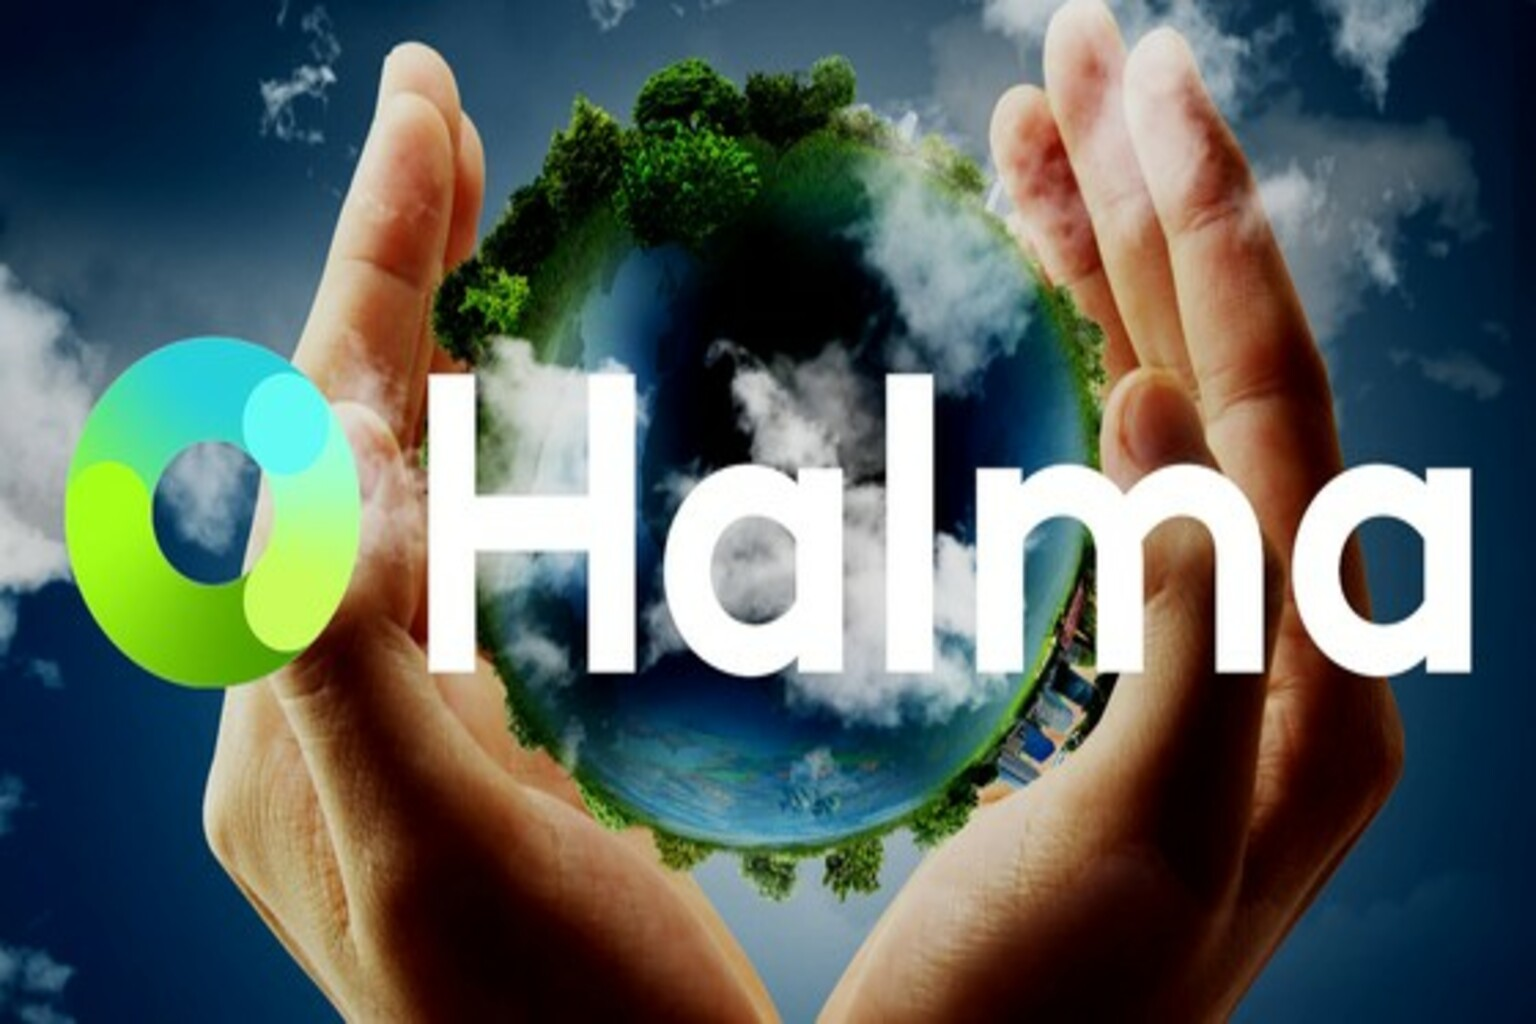 halma-regifrs-thumbnail